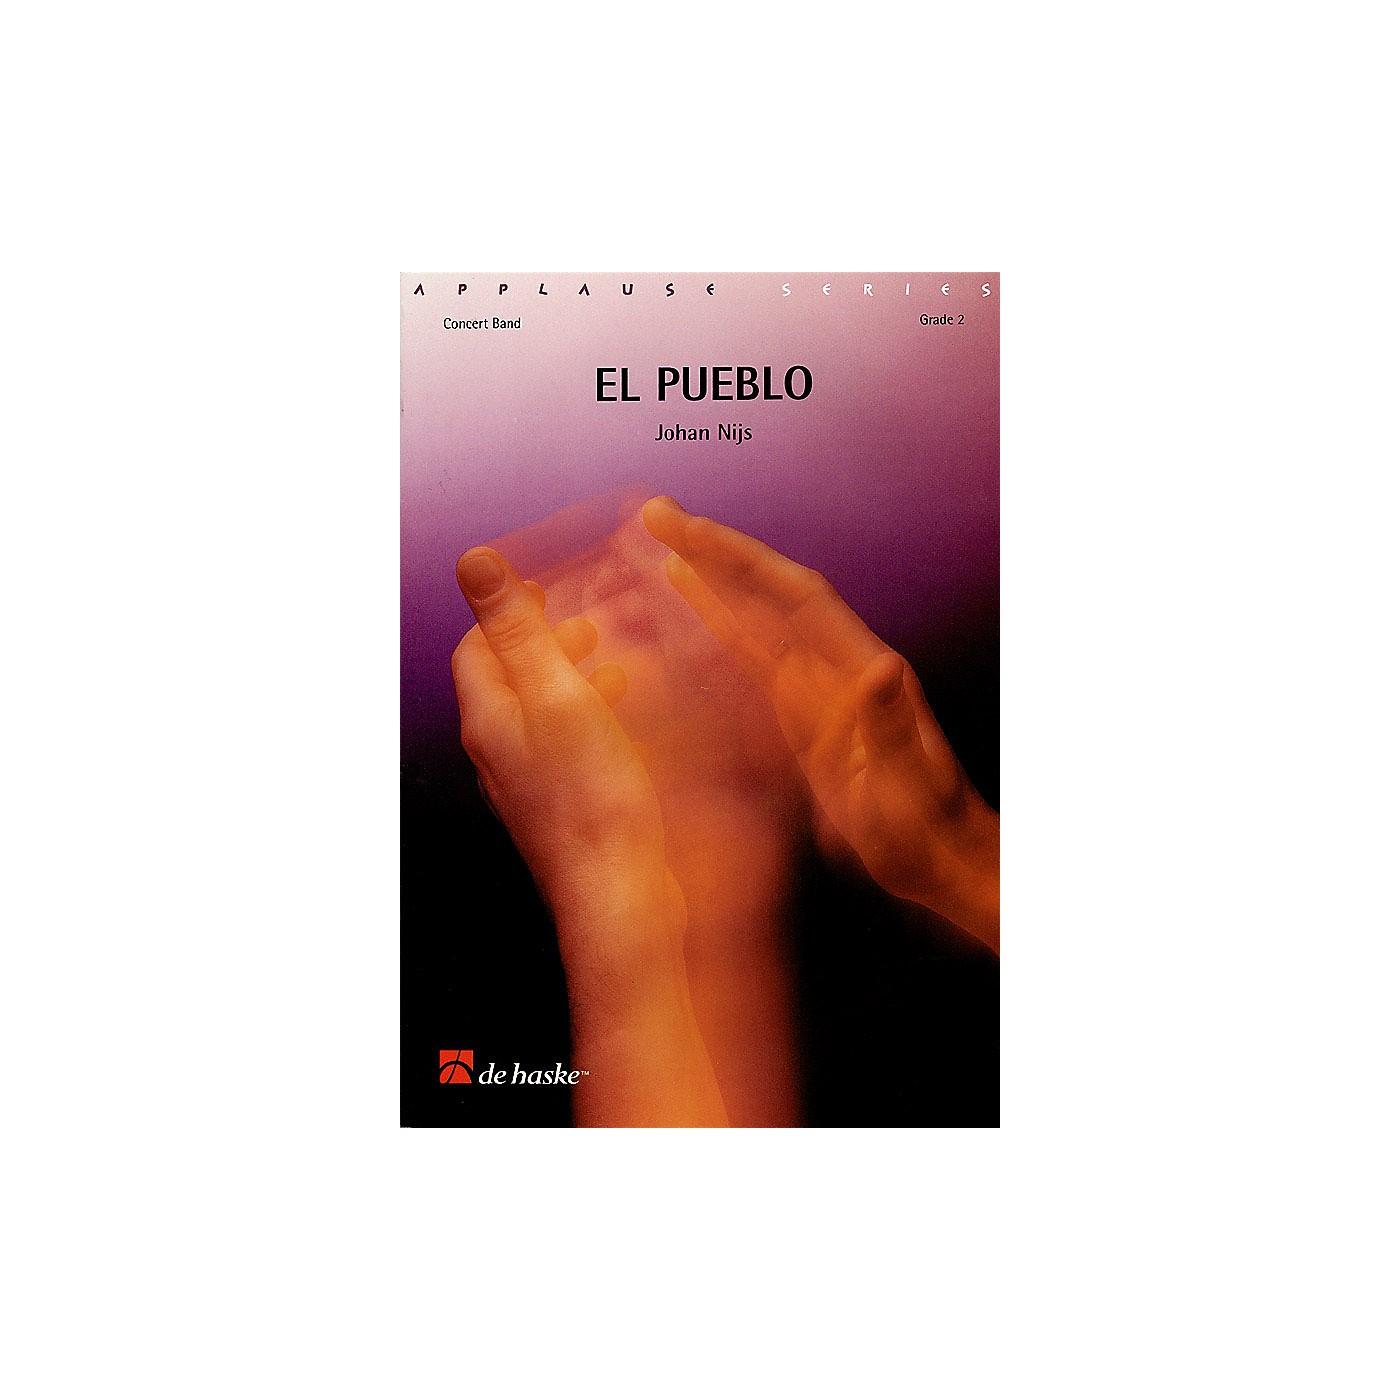 Hal Leonard El Pueblo Sc Only Grade 3 Concert Band thumbnail